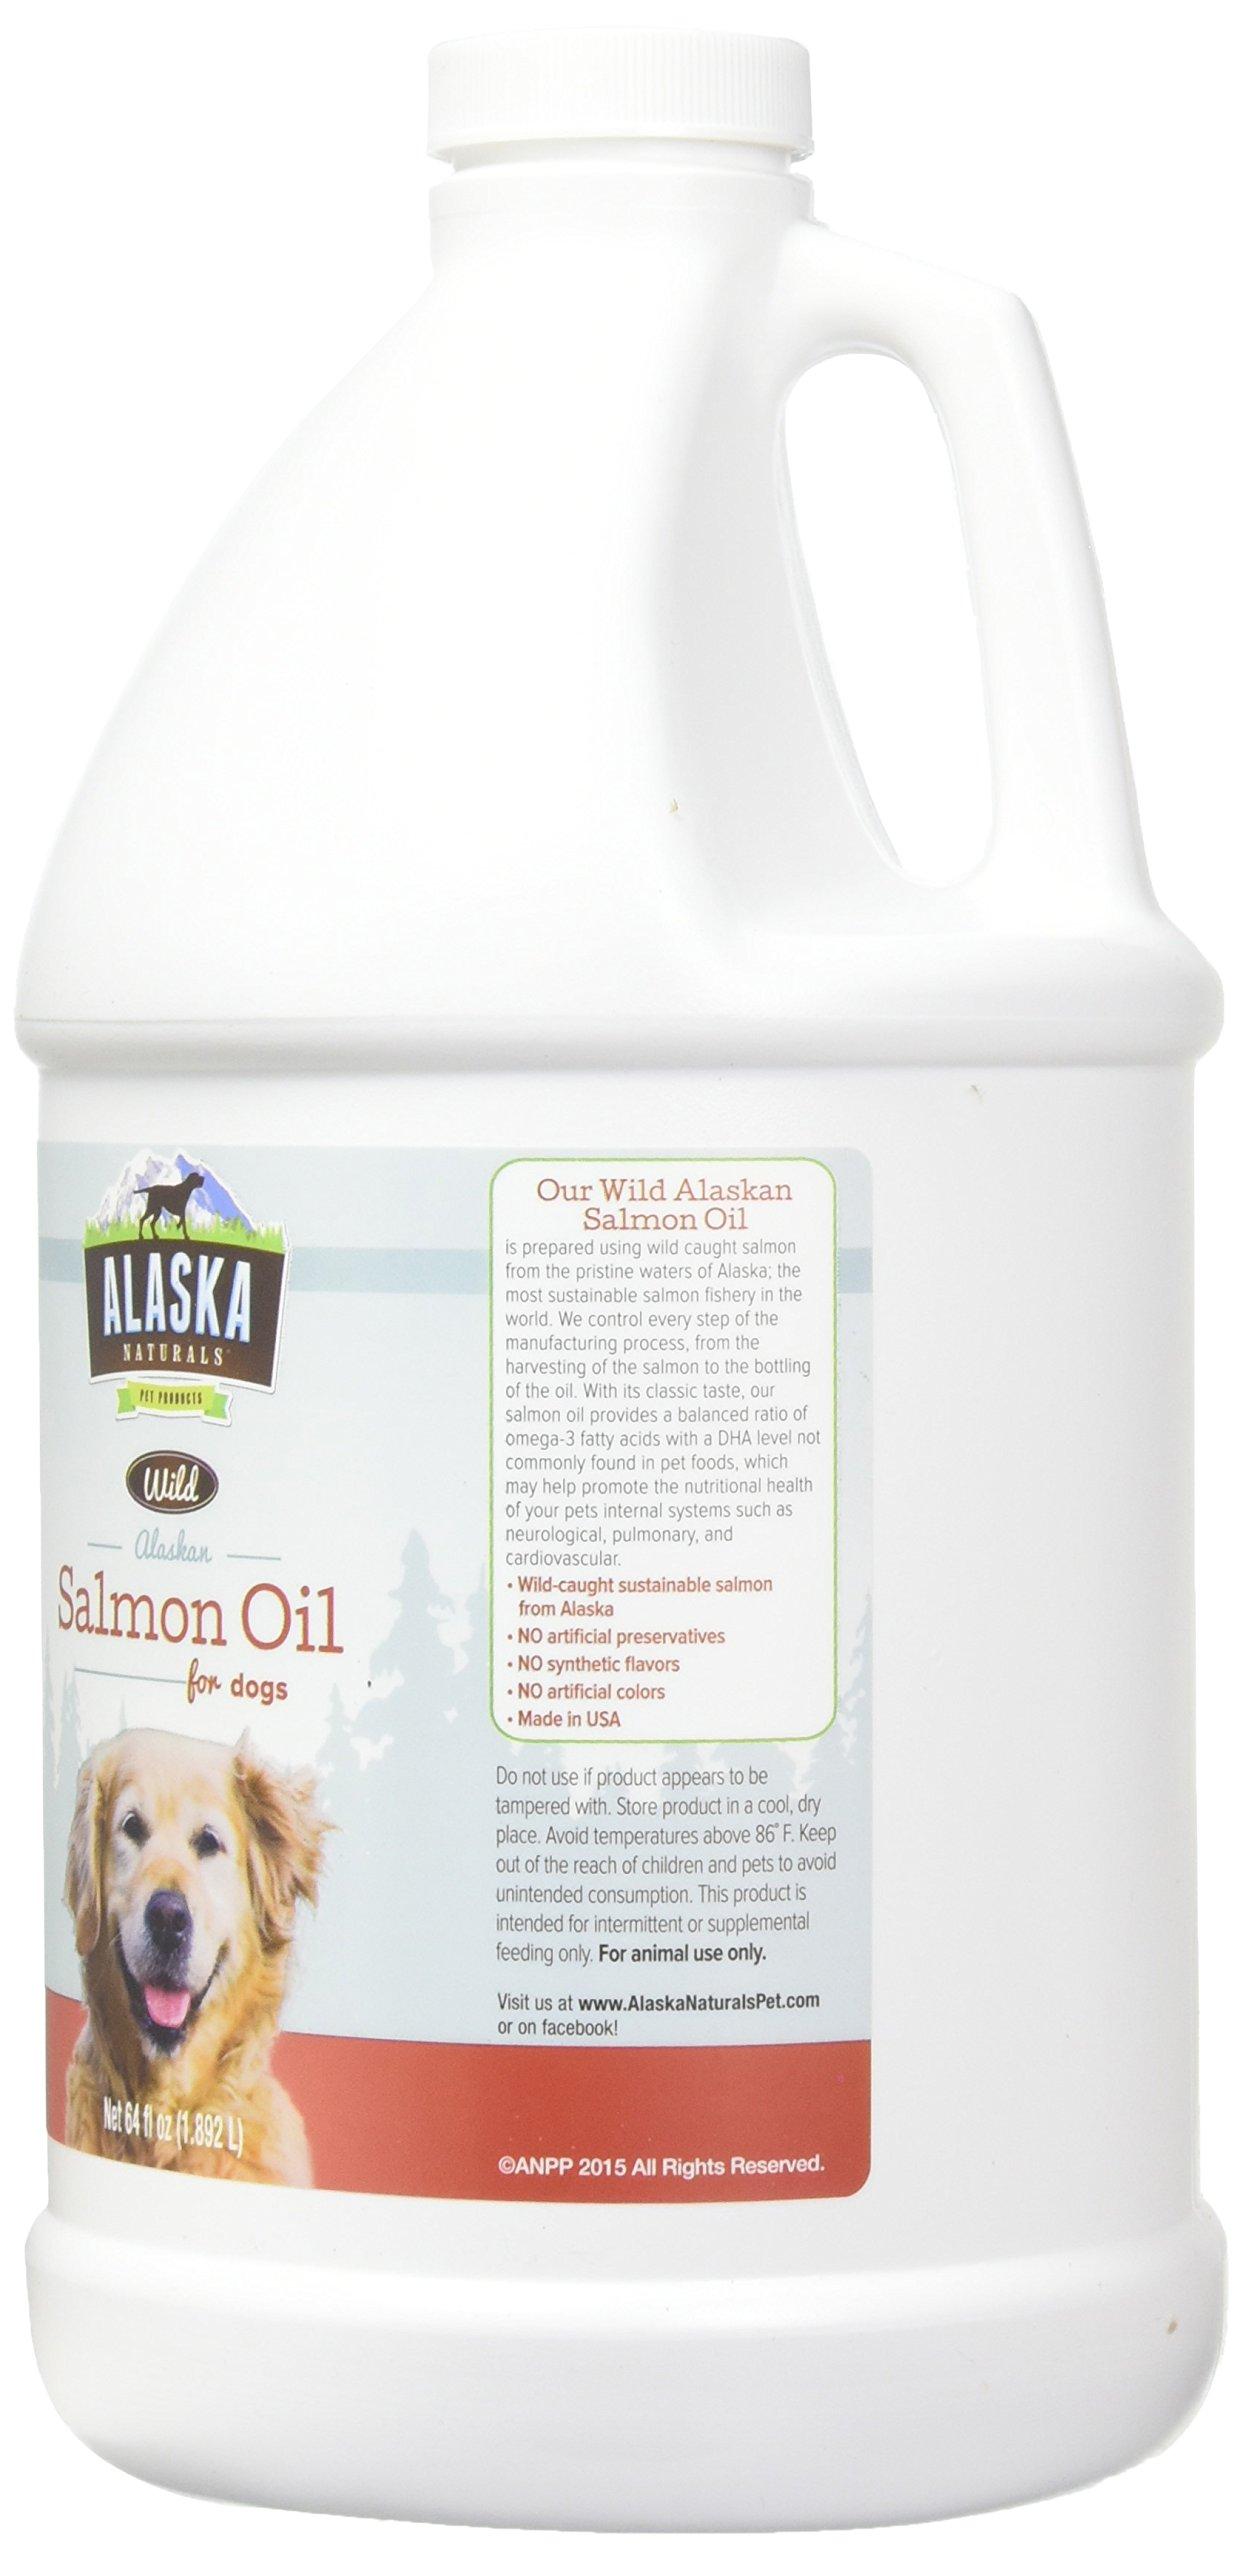 Alaska Naturals Salmon Oil for Dogs 4